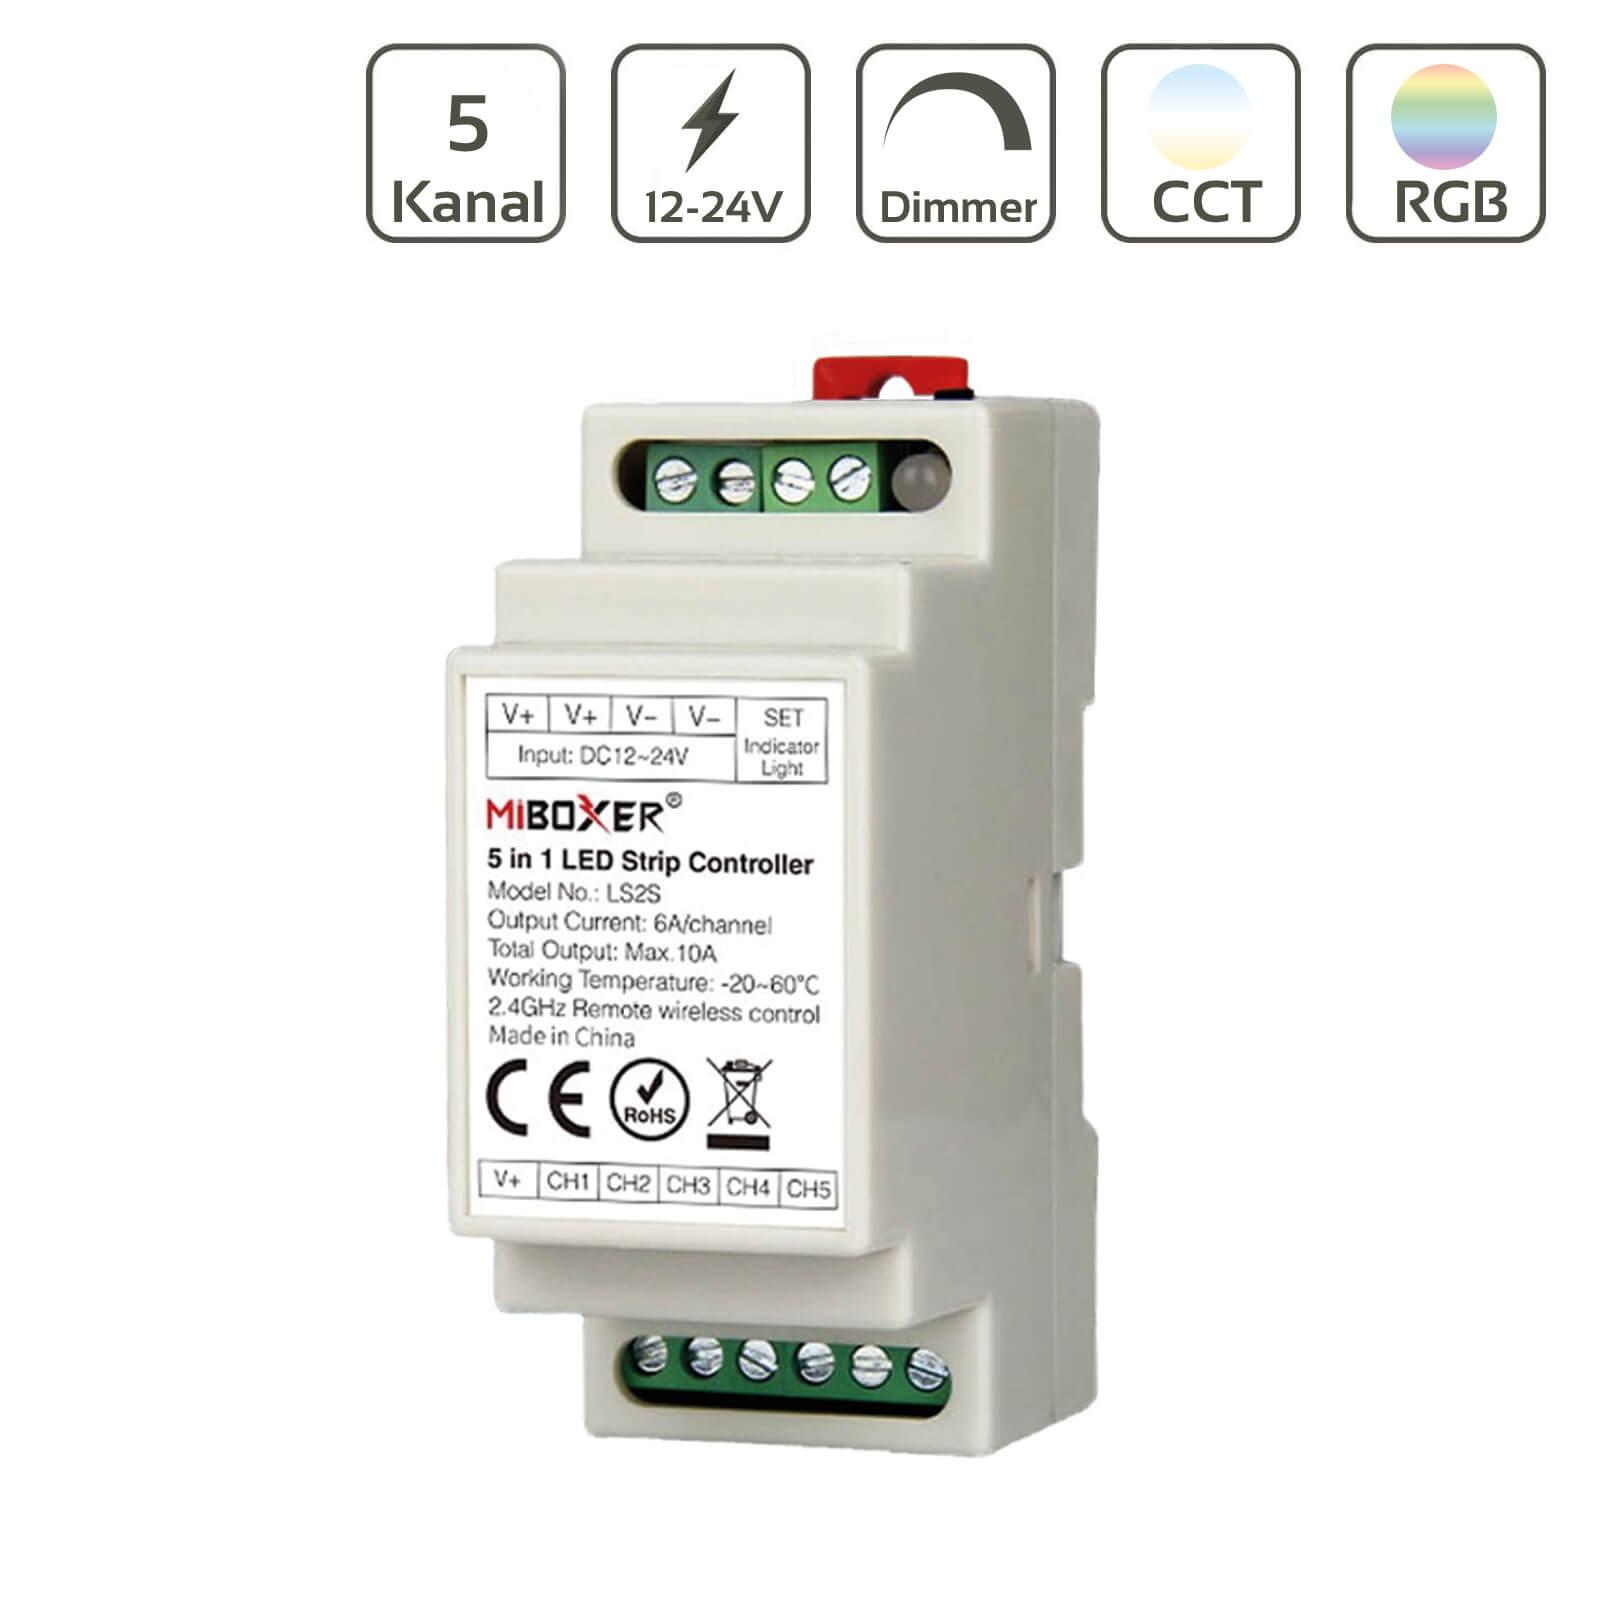 5in1 Smart Controller Hutschiene 2.4GHz WiFi ready